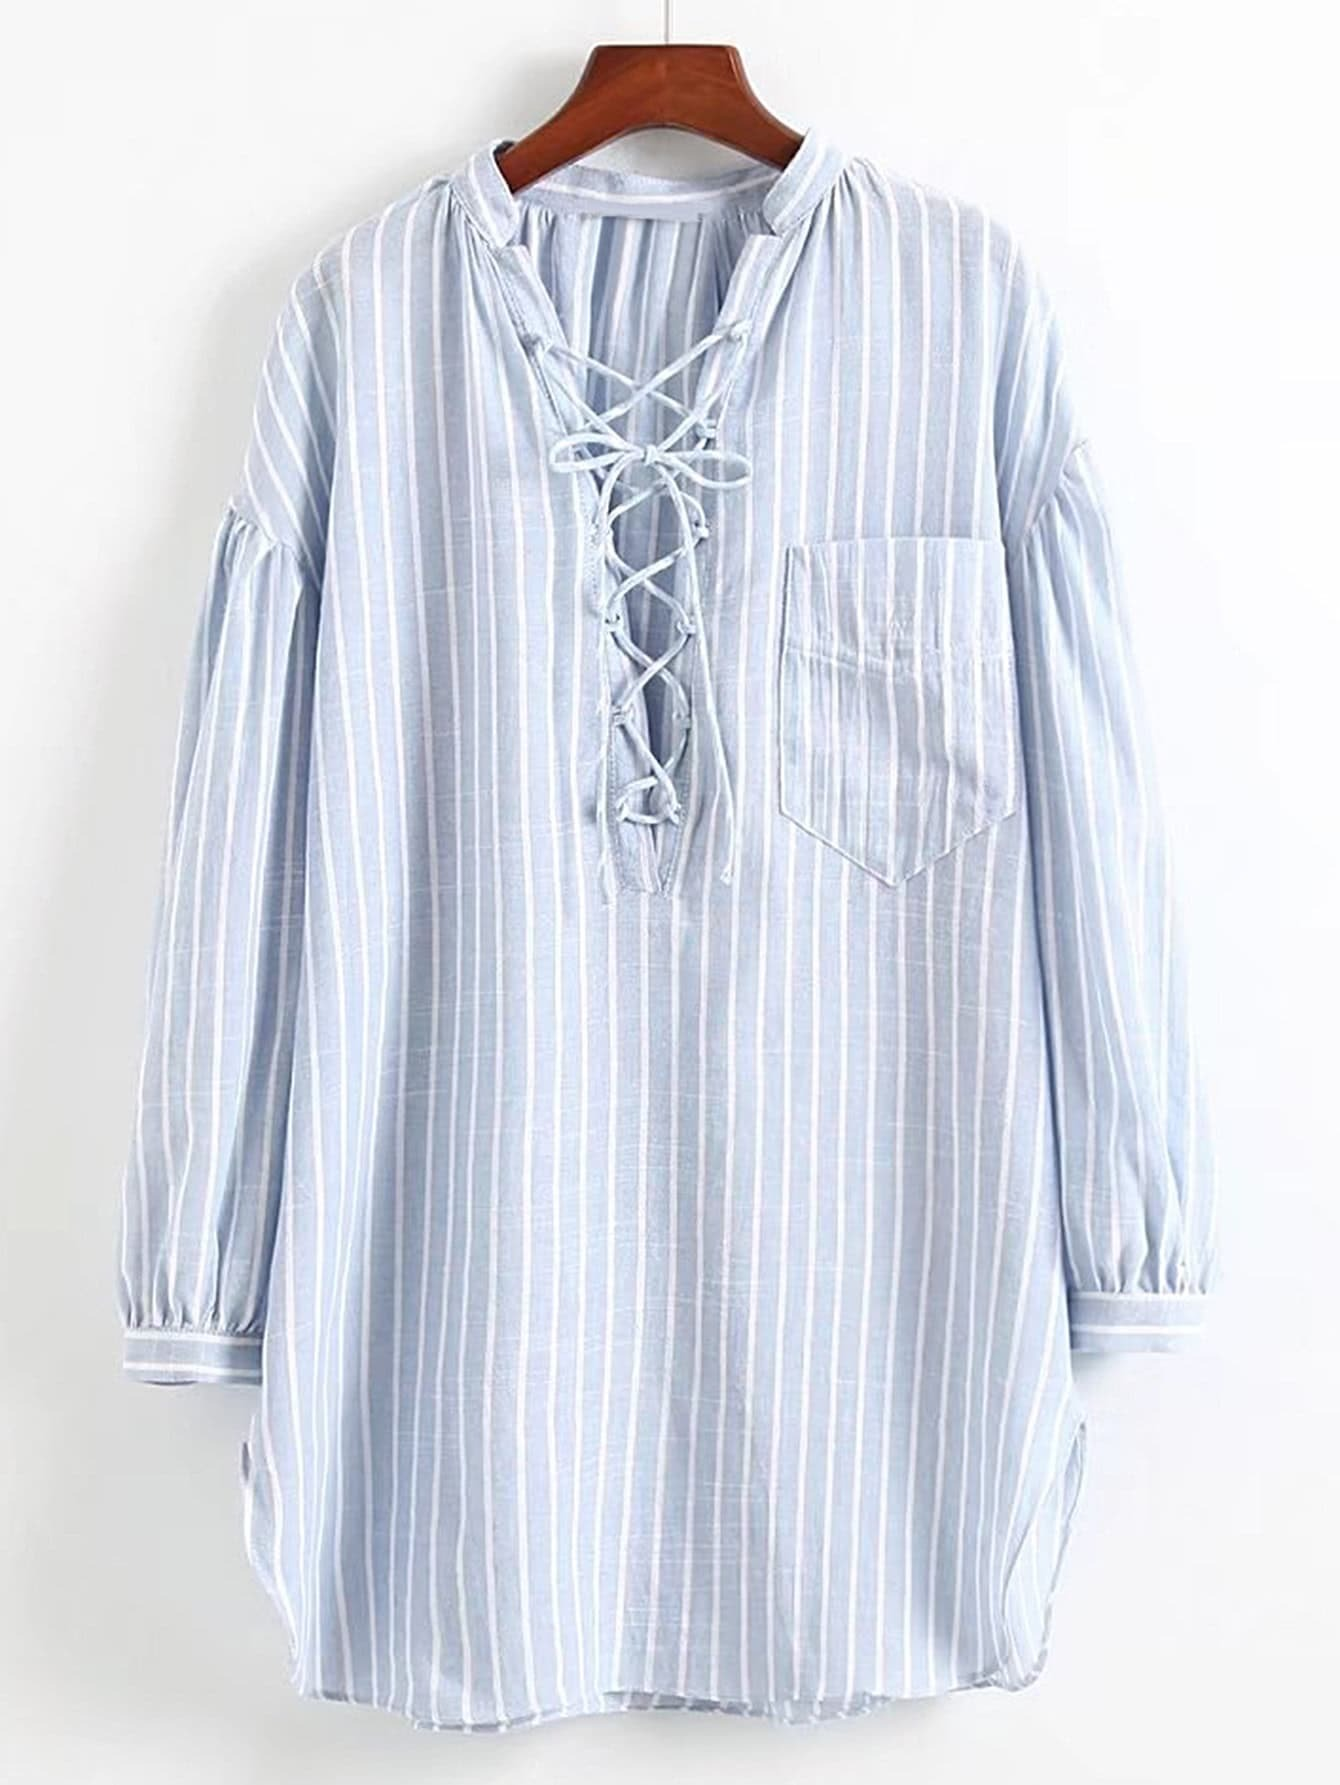 Lace Up V Neck Vertical Striped Shirt Dress dress170713207